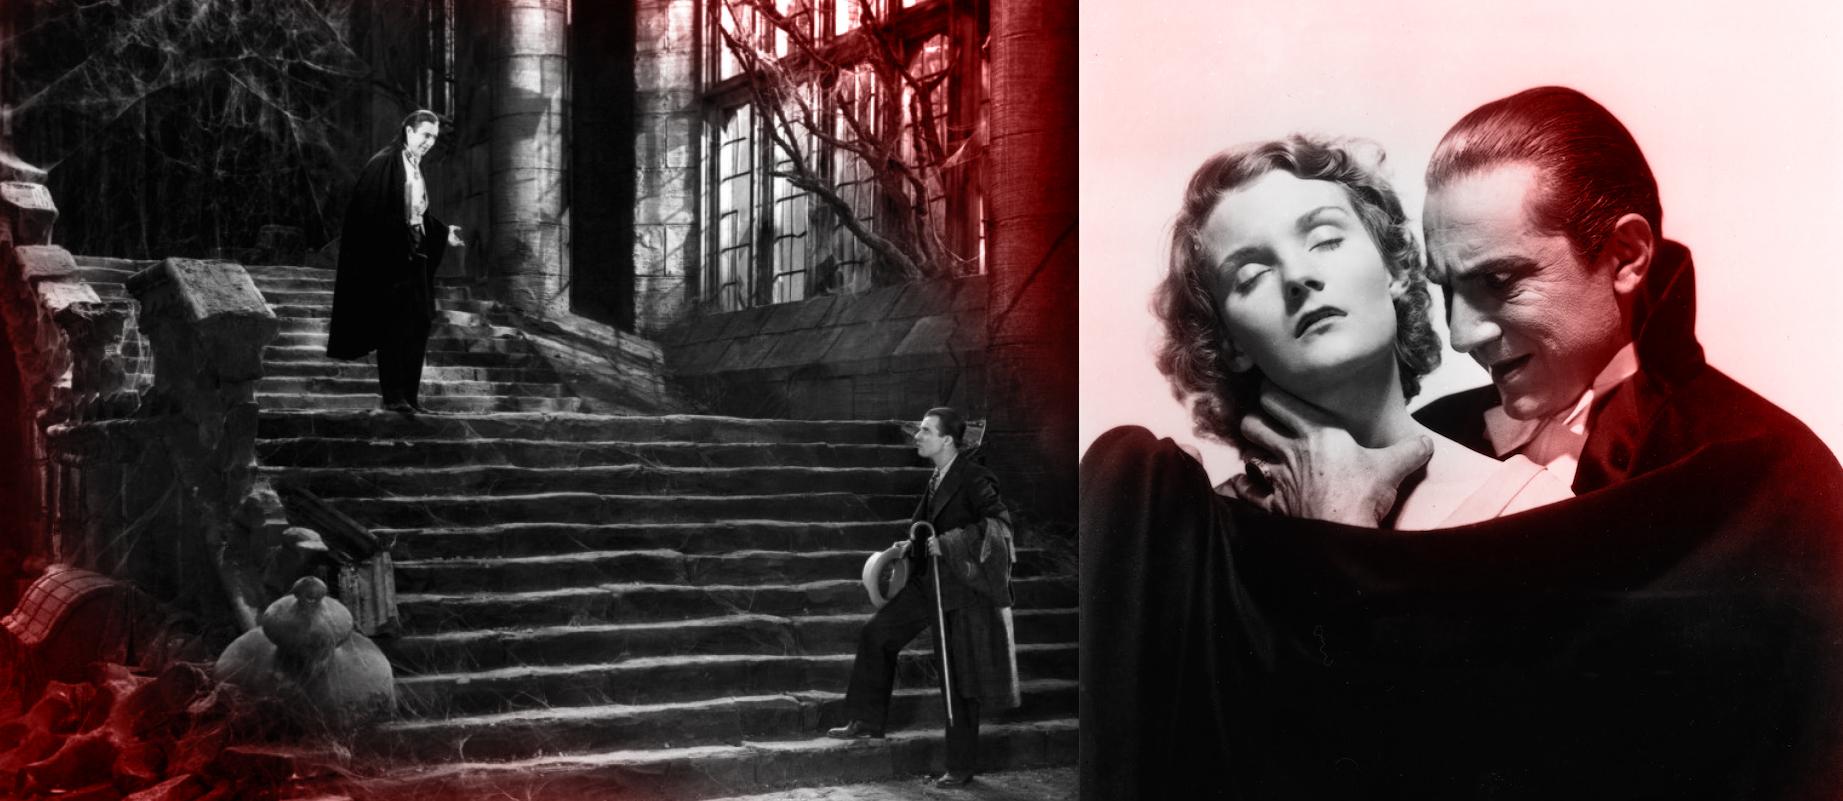 Robert Tharp Your Choice : Dracula